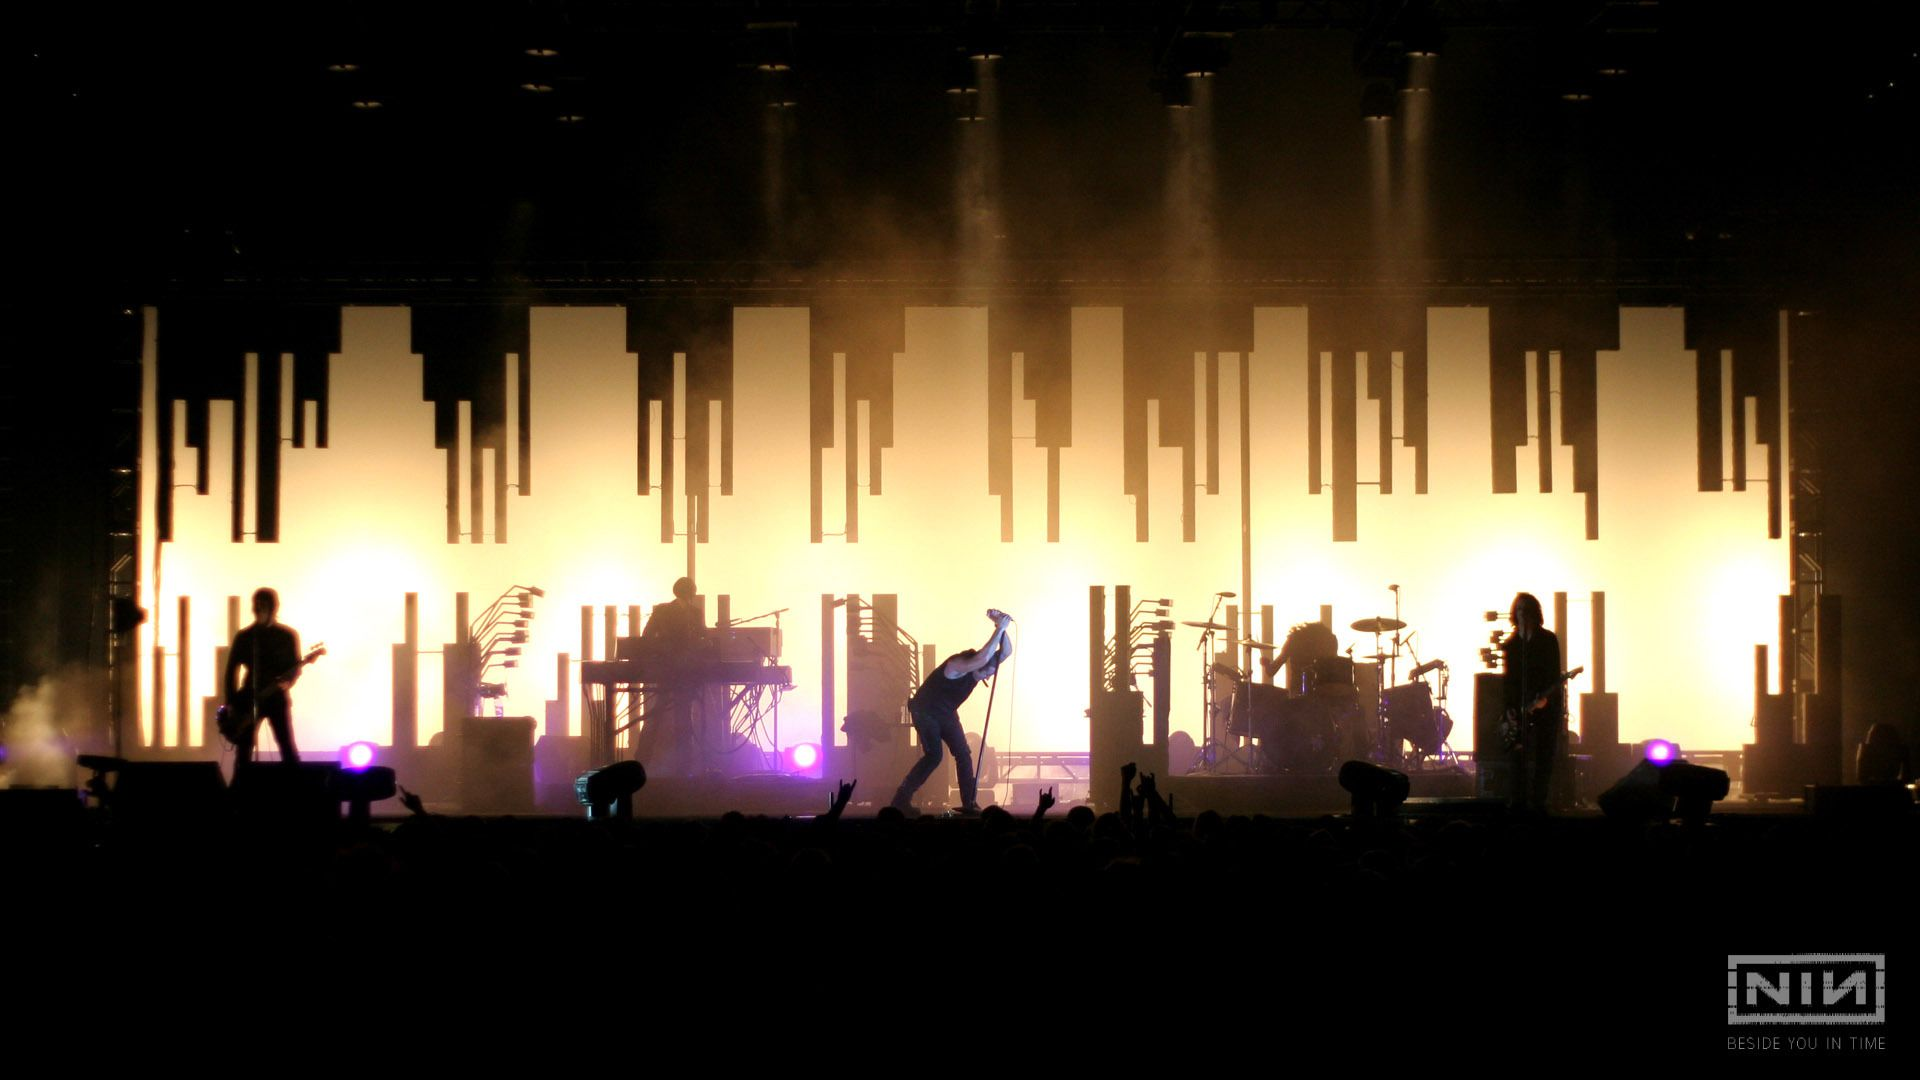 52 Best Wallpaper Images Nine Inch Nails Wallpaper Trent Reznor